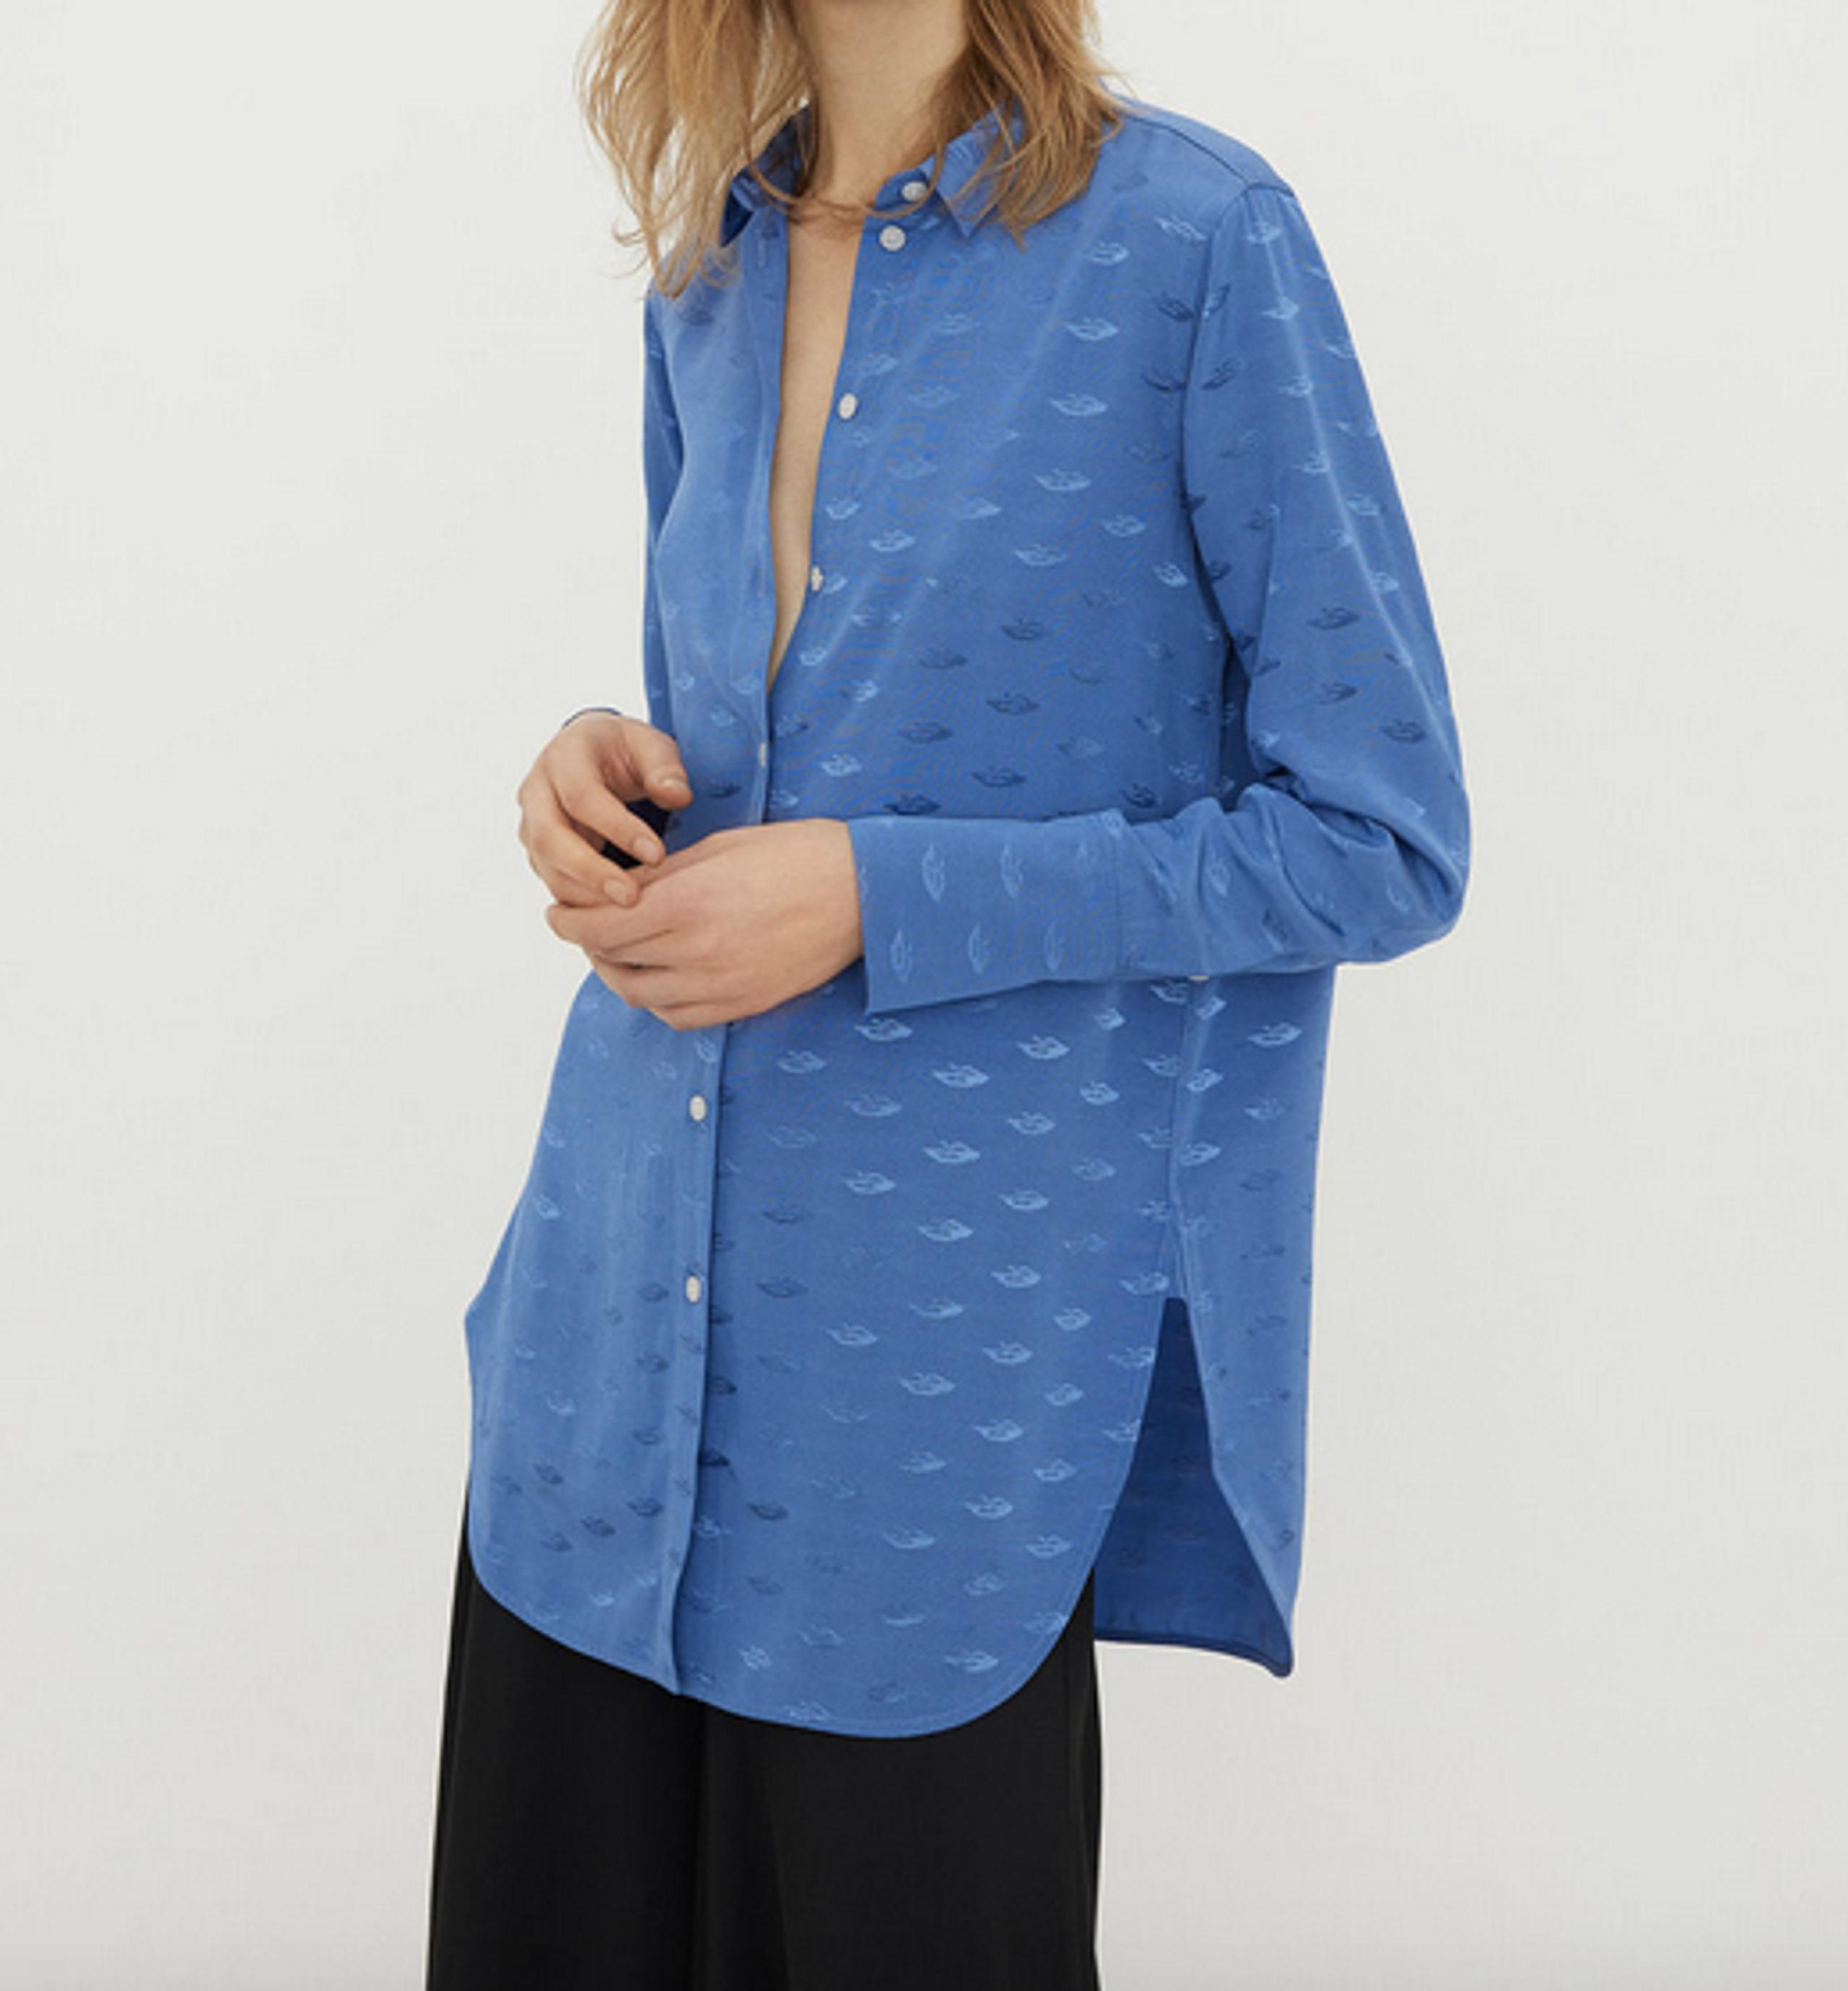 eeafe848eba1 ... By Malene Birger - Shirt - SHI1004S91 - Vintage Blue ...